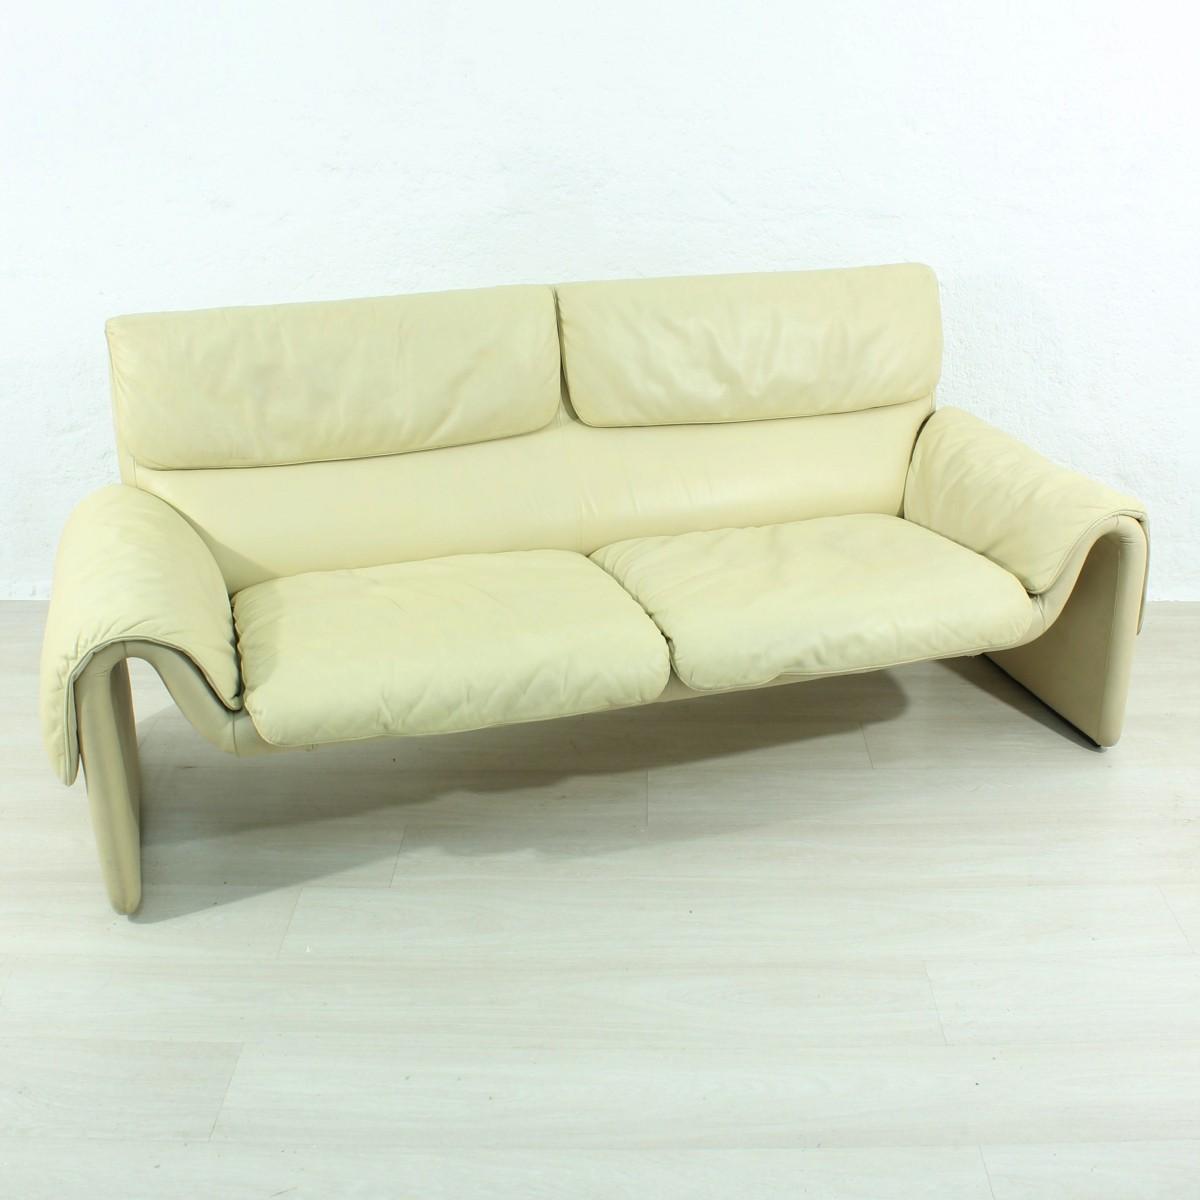 Full Size of De Sede Sofa Preise Ds 600 For Sale Leder Gebraucht Endless By Uk Furniture Sessel Schweiz Outlet Kaufen Usa Bed Swiss Leather Couch Immobilienmakler Baden Sofa De Sede Sofa